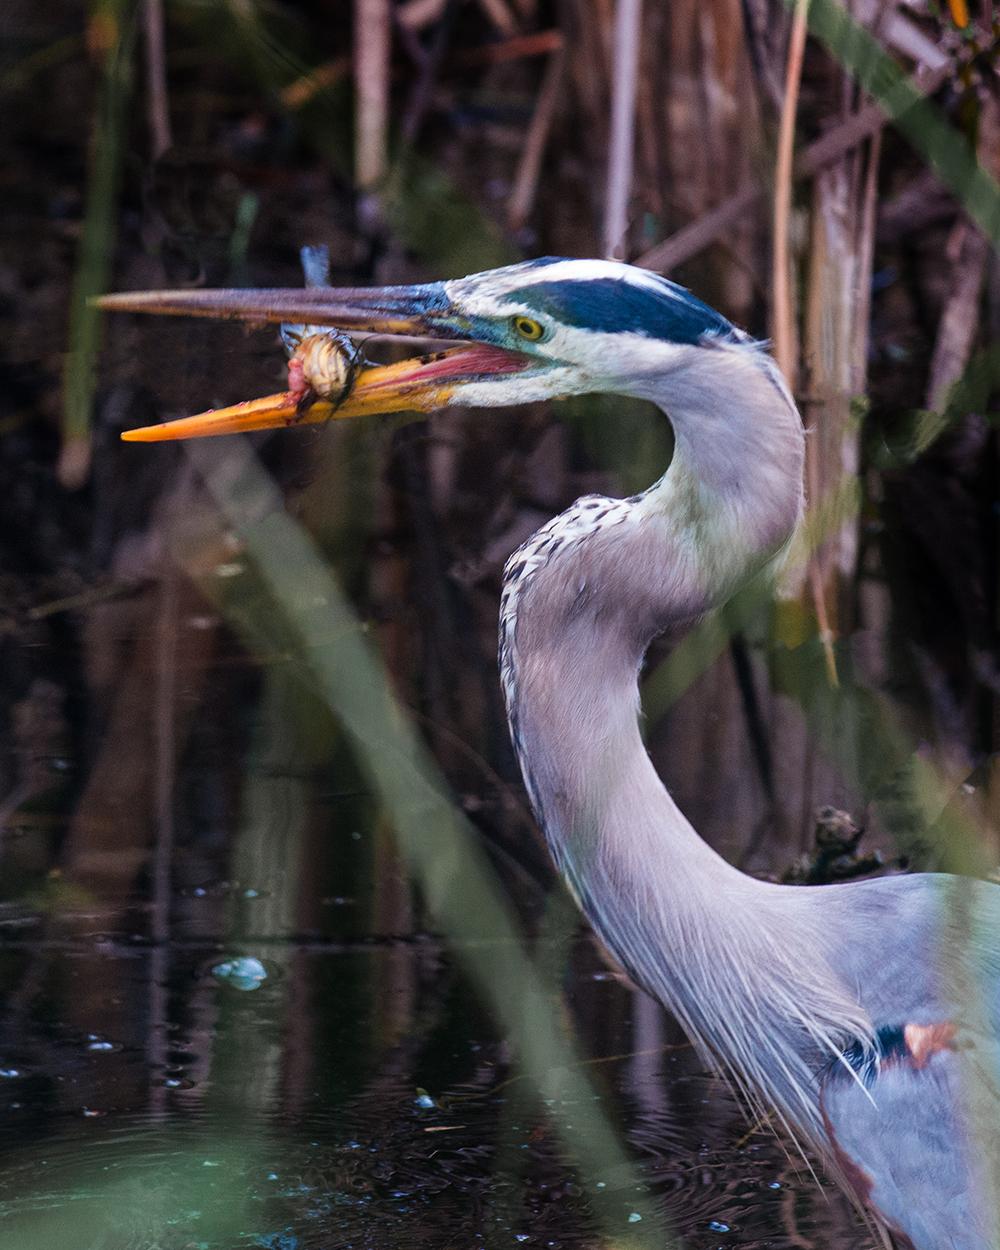 #blueheron, #greatblueheron, #heron, #everglades, #florida, #willdlife, #nature, #nationalpark